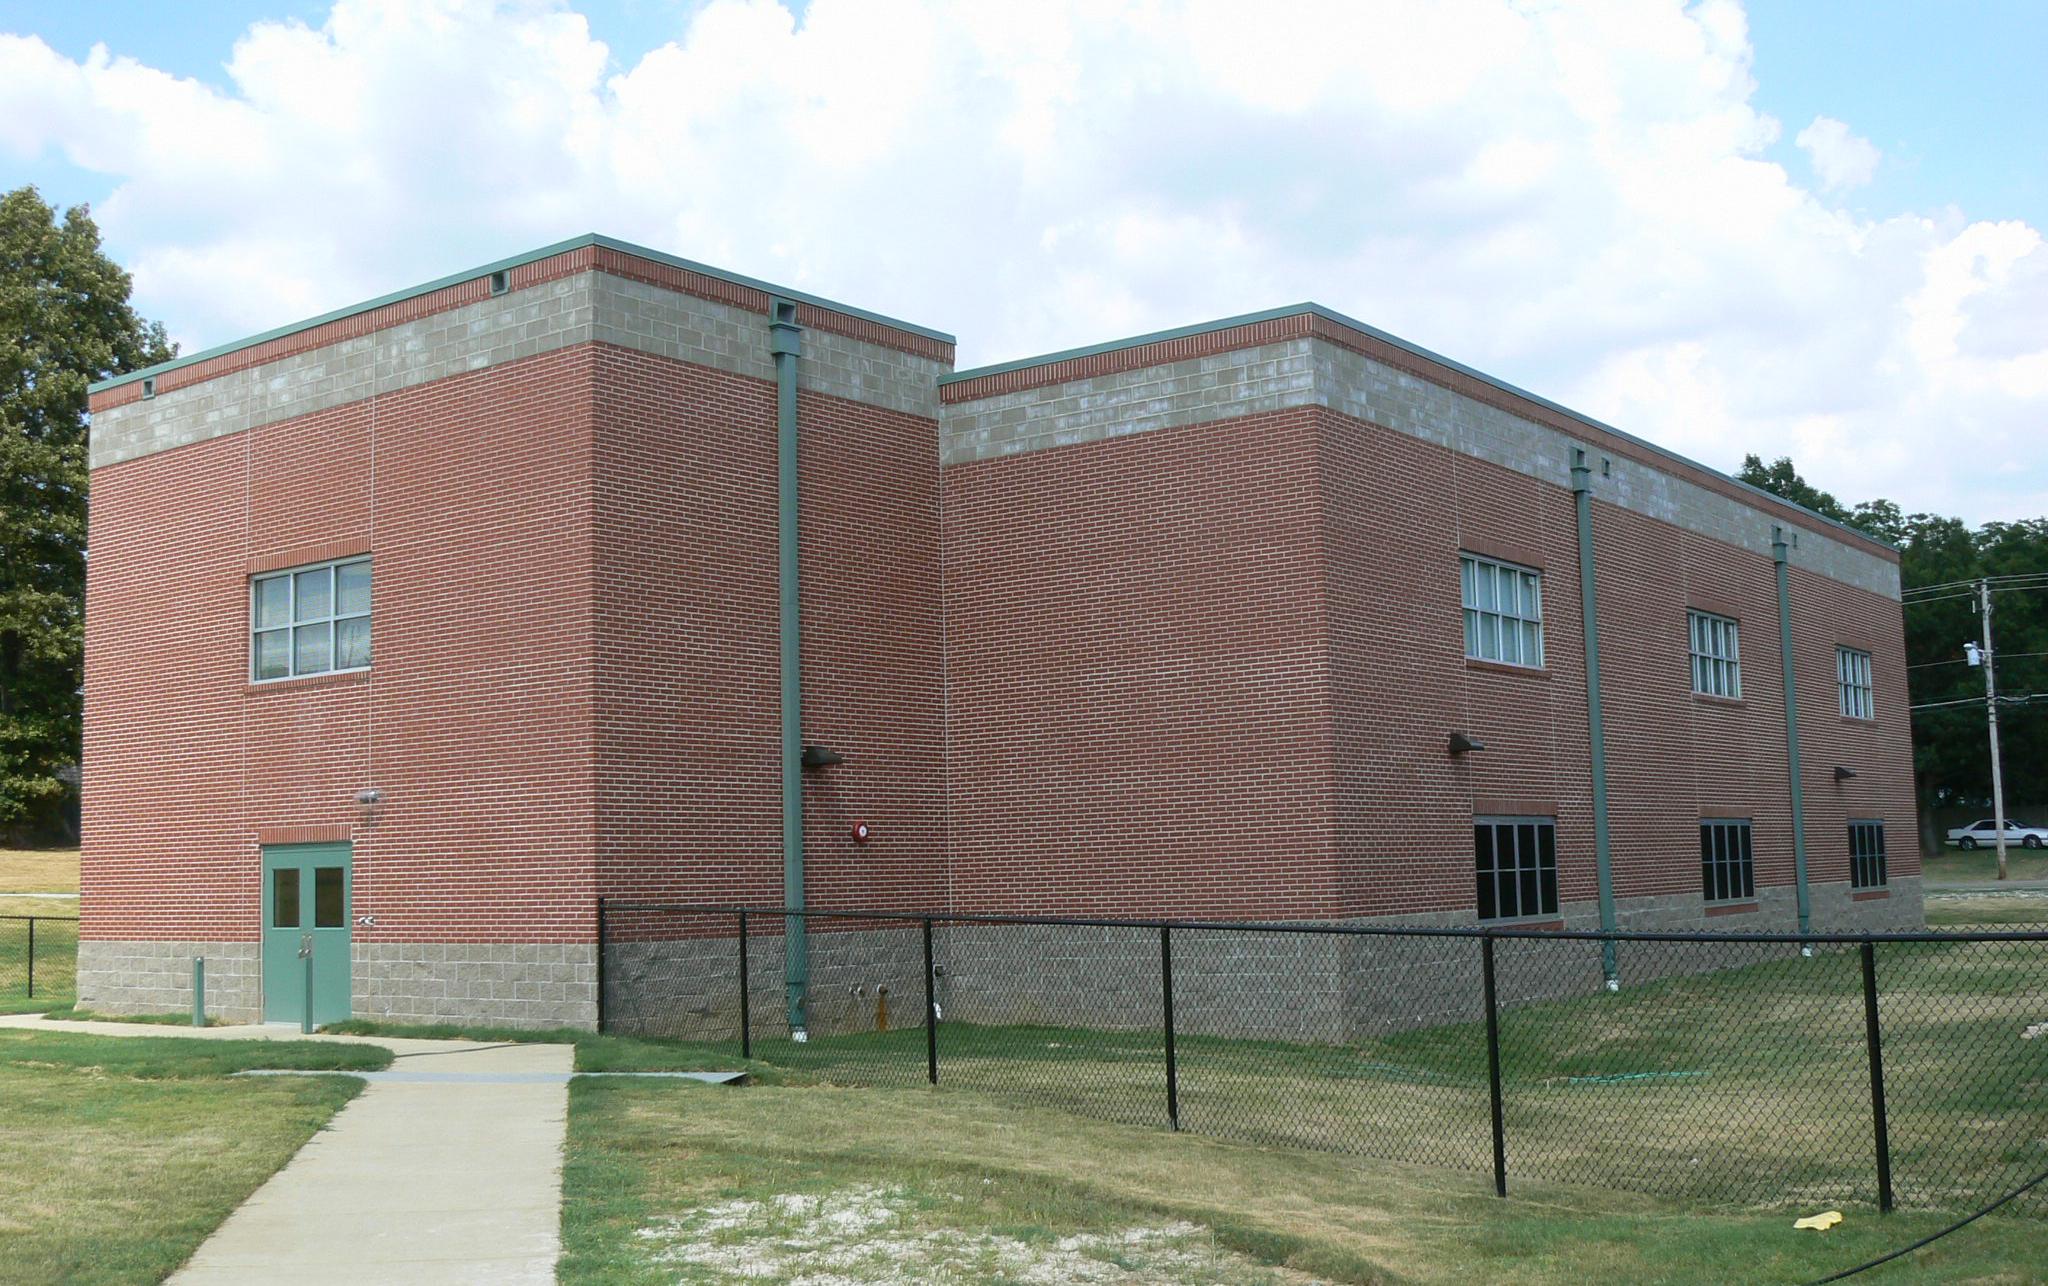 Kate Bond Elementary School